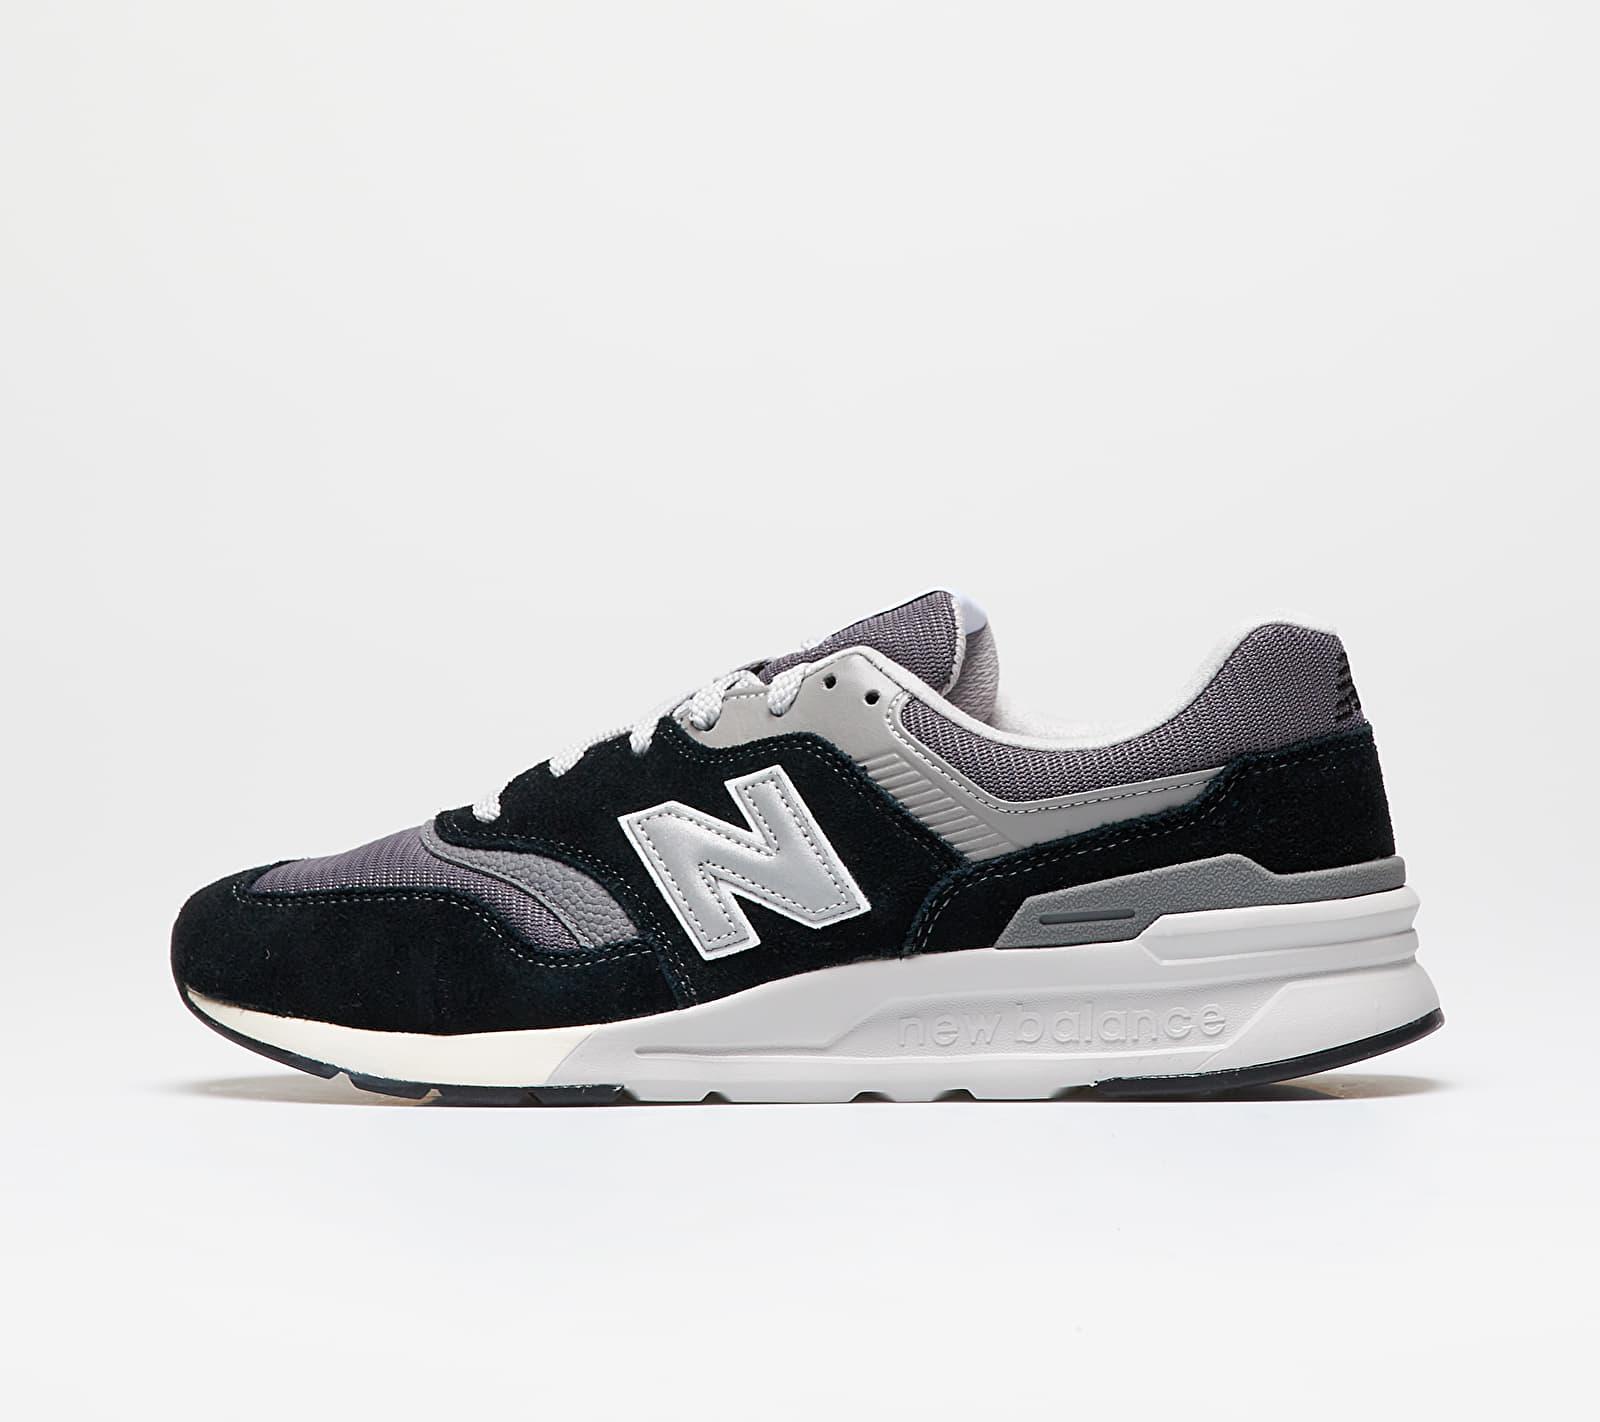 New Balance 997 Black/ Gray EUR 41.5